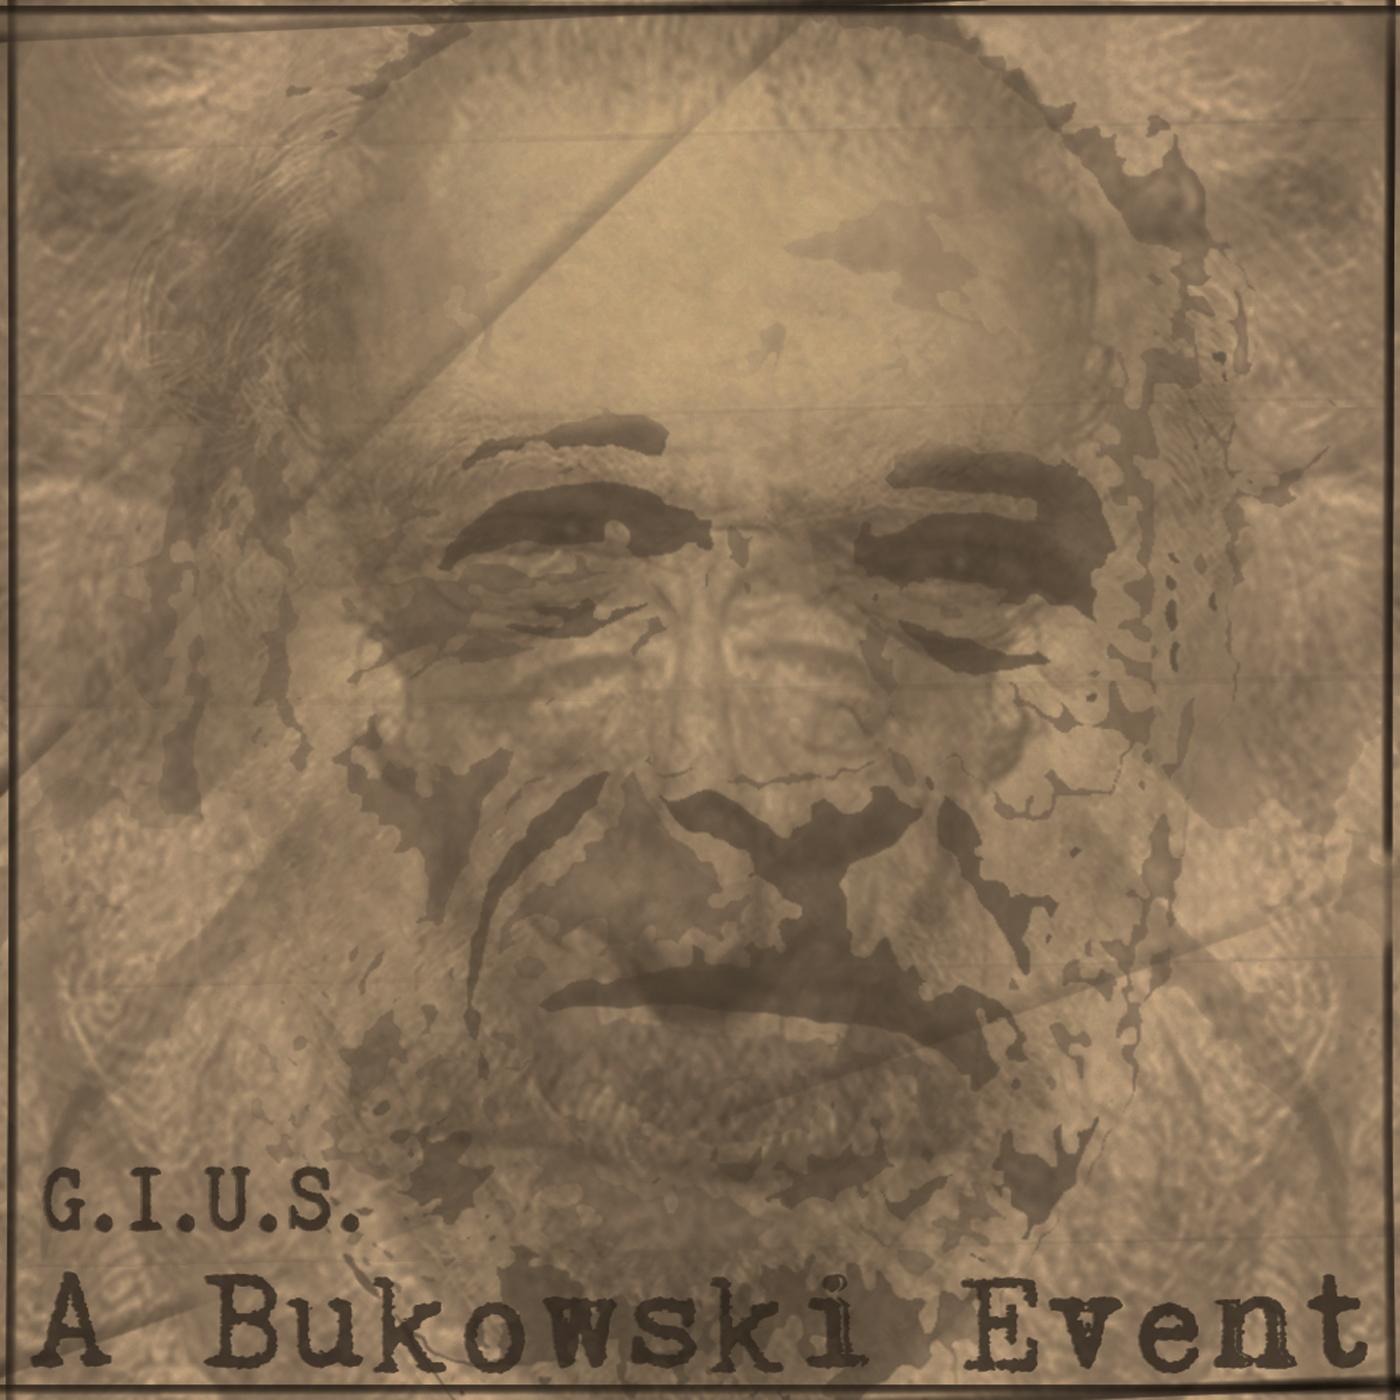 Giuliano Gius Cobelli - A Bukowski Event